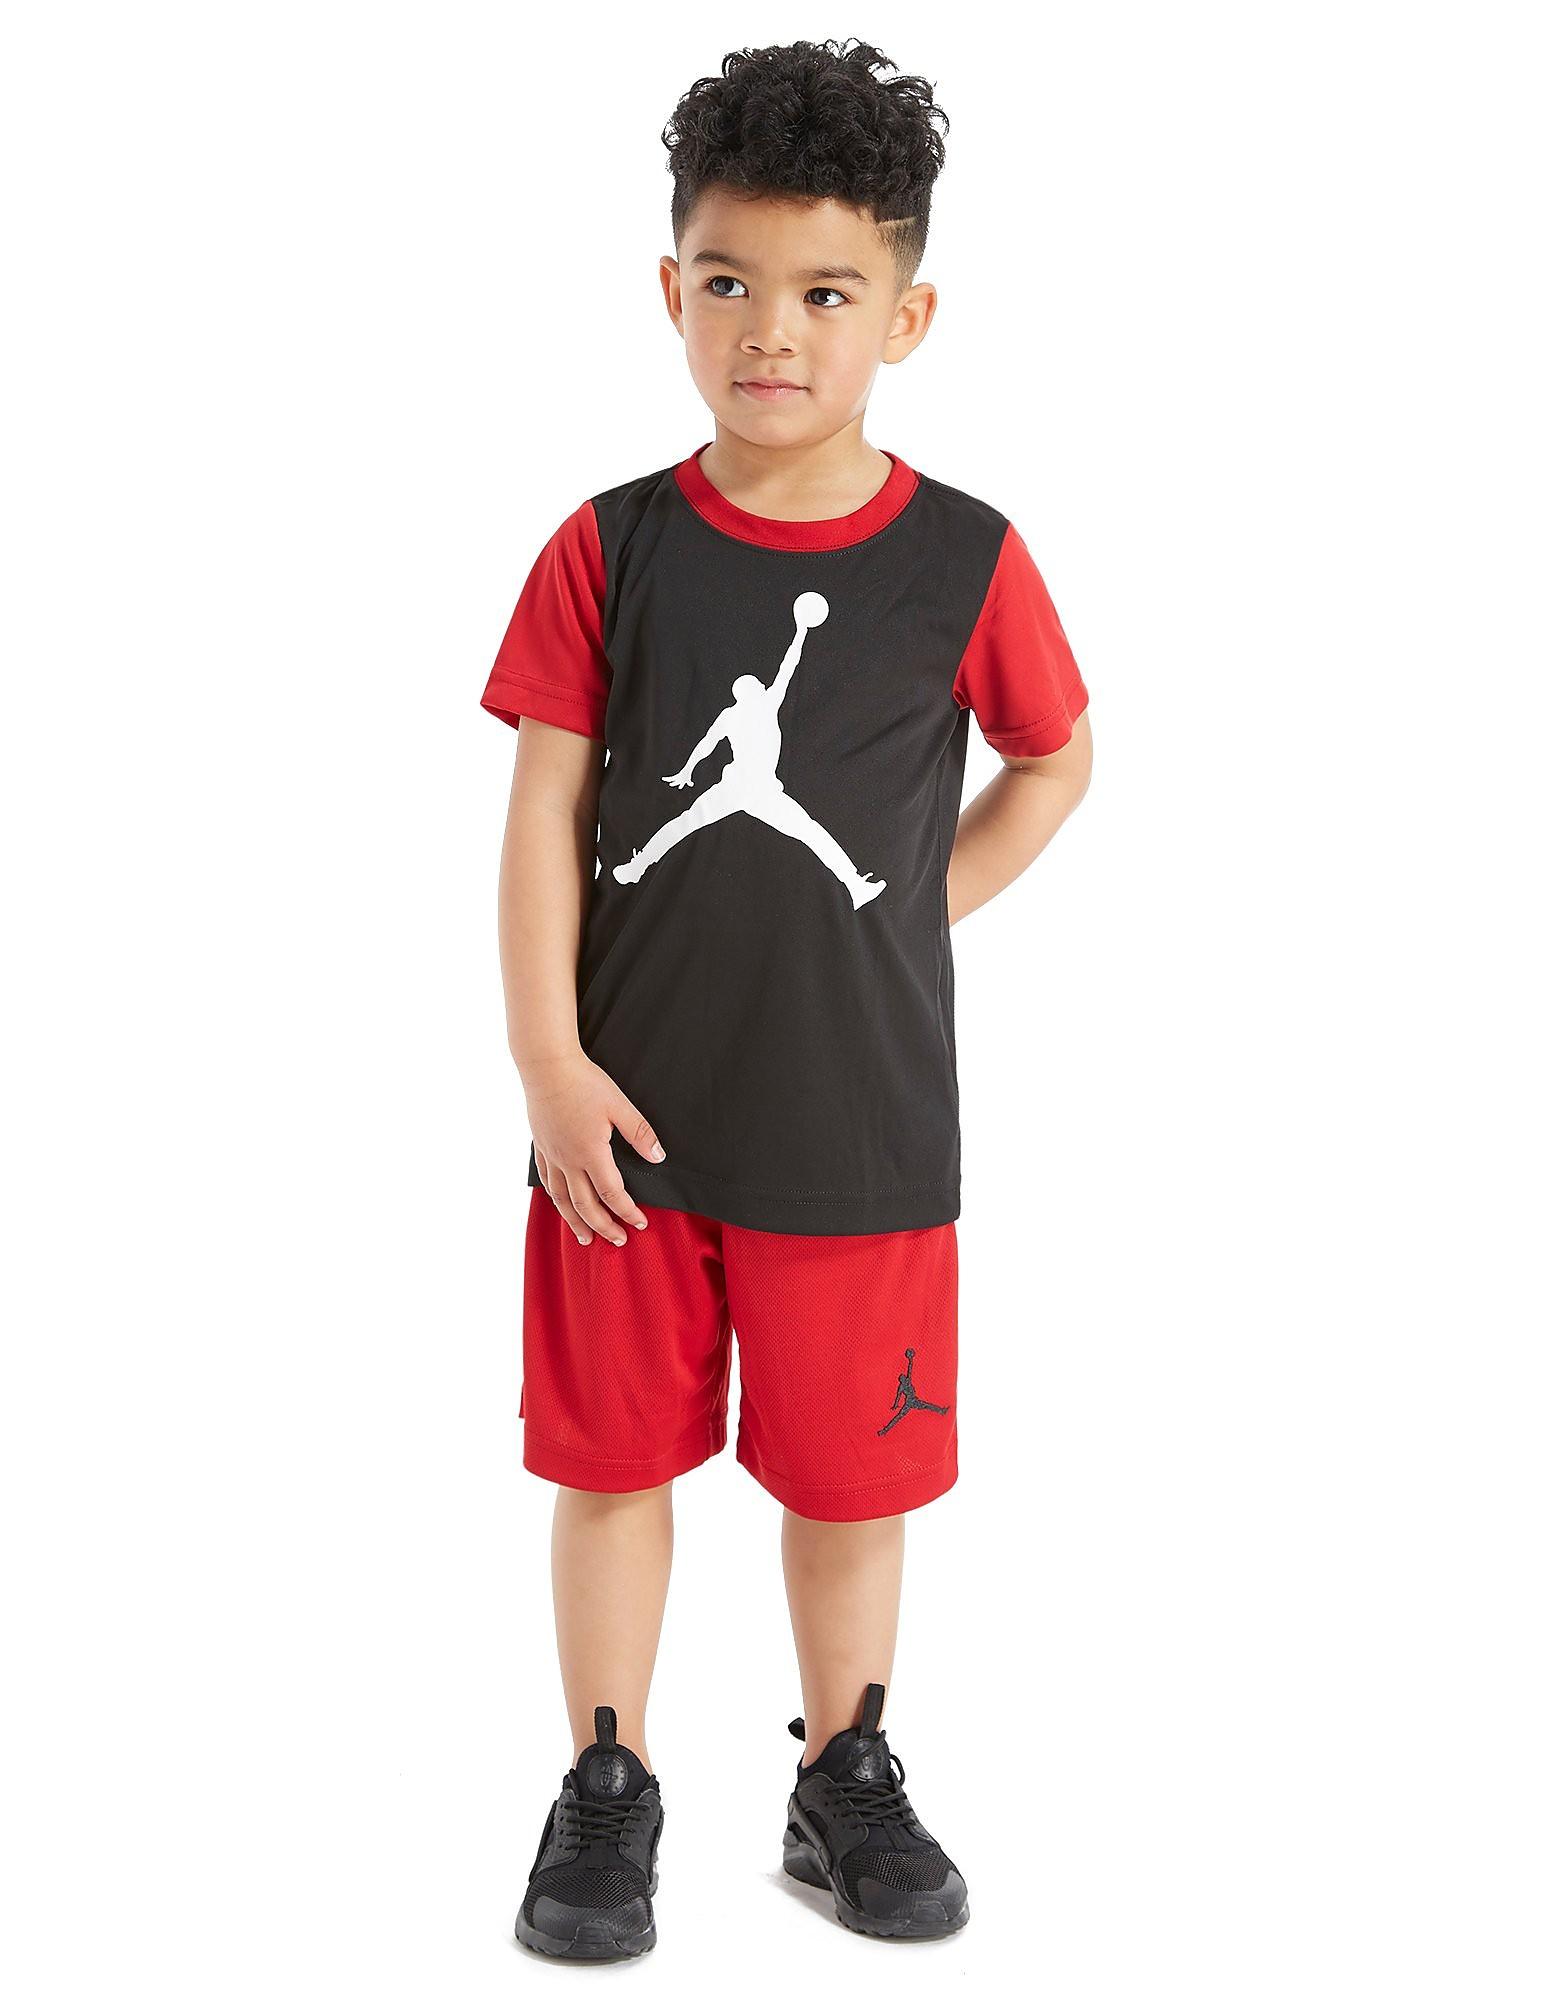 Jordan Ensemble Jumpman 4 Life T-Shirt/Short Enfant